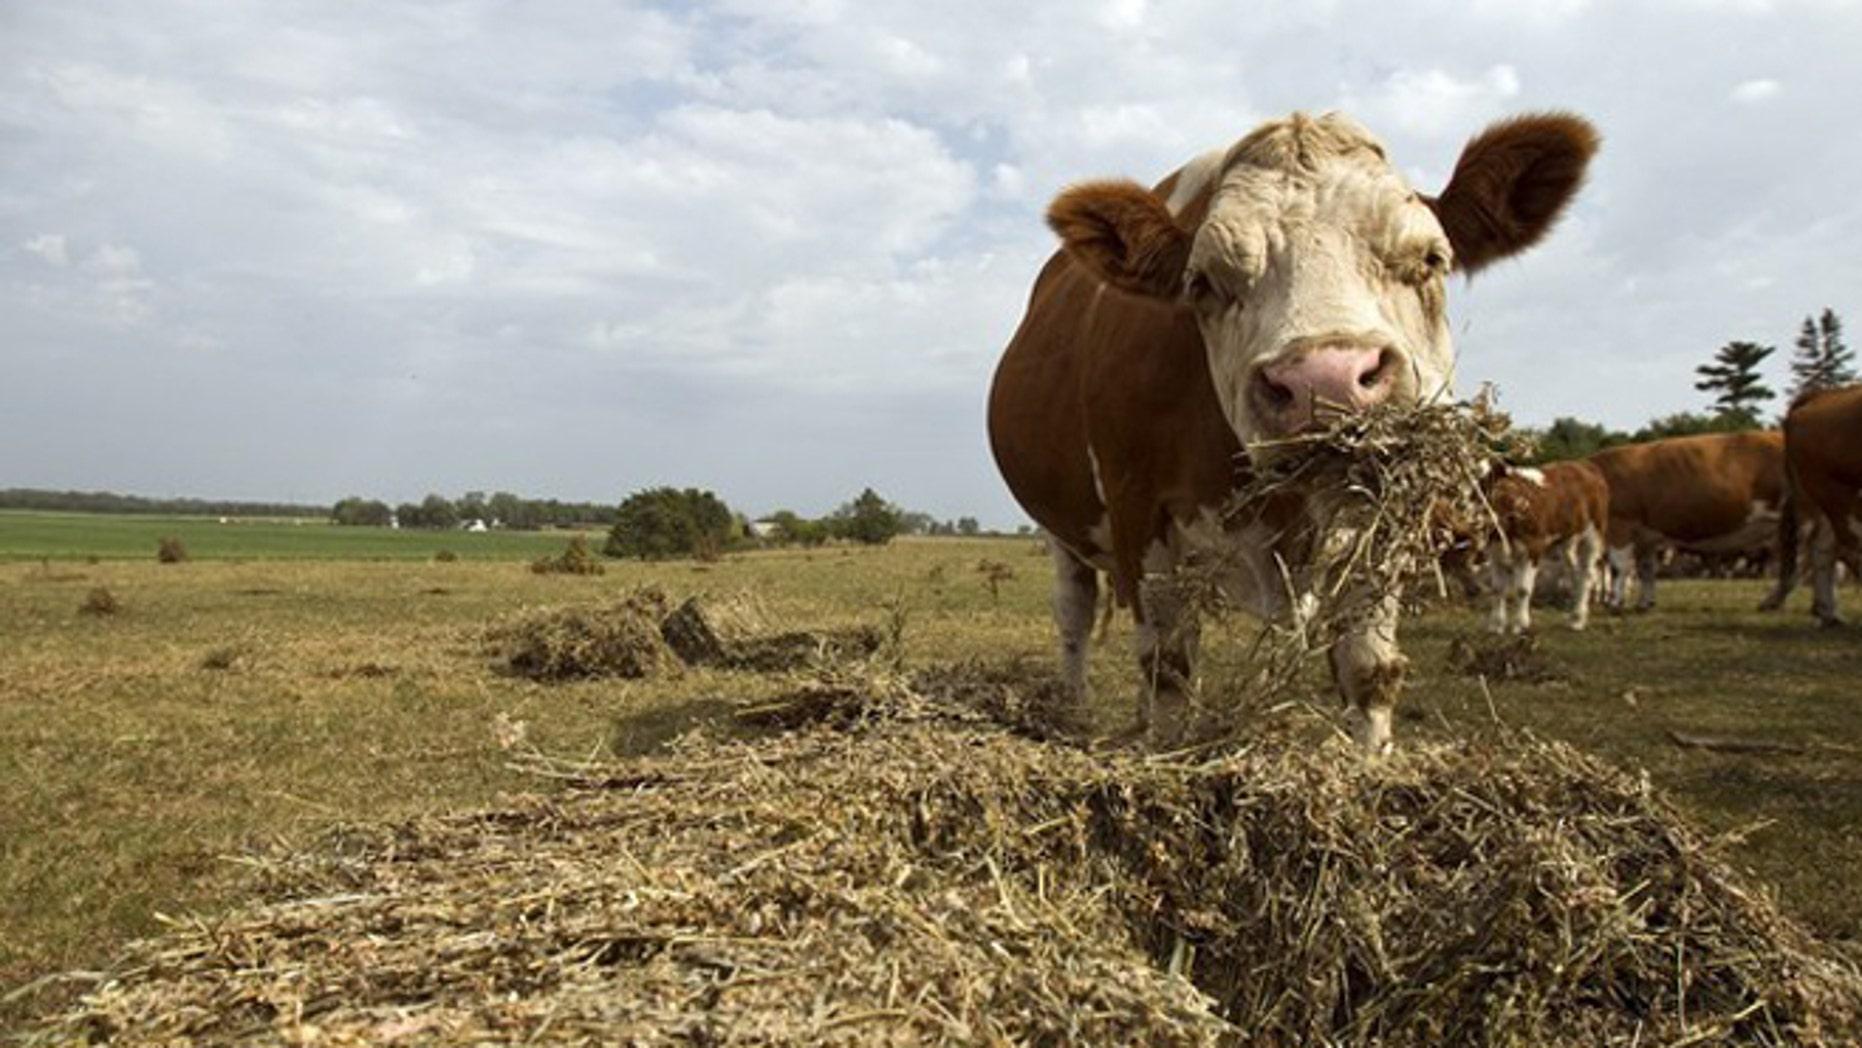 July 18, 2012: A cow feeds on hay near Rowley, Iowa.